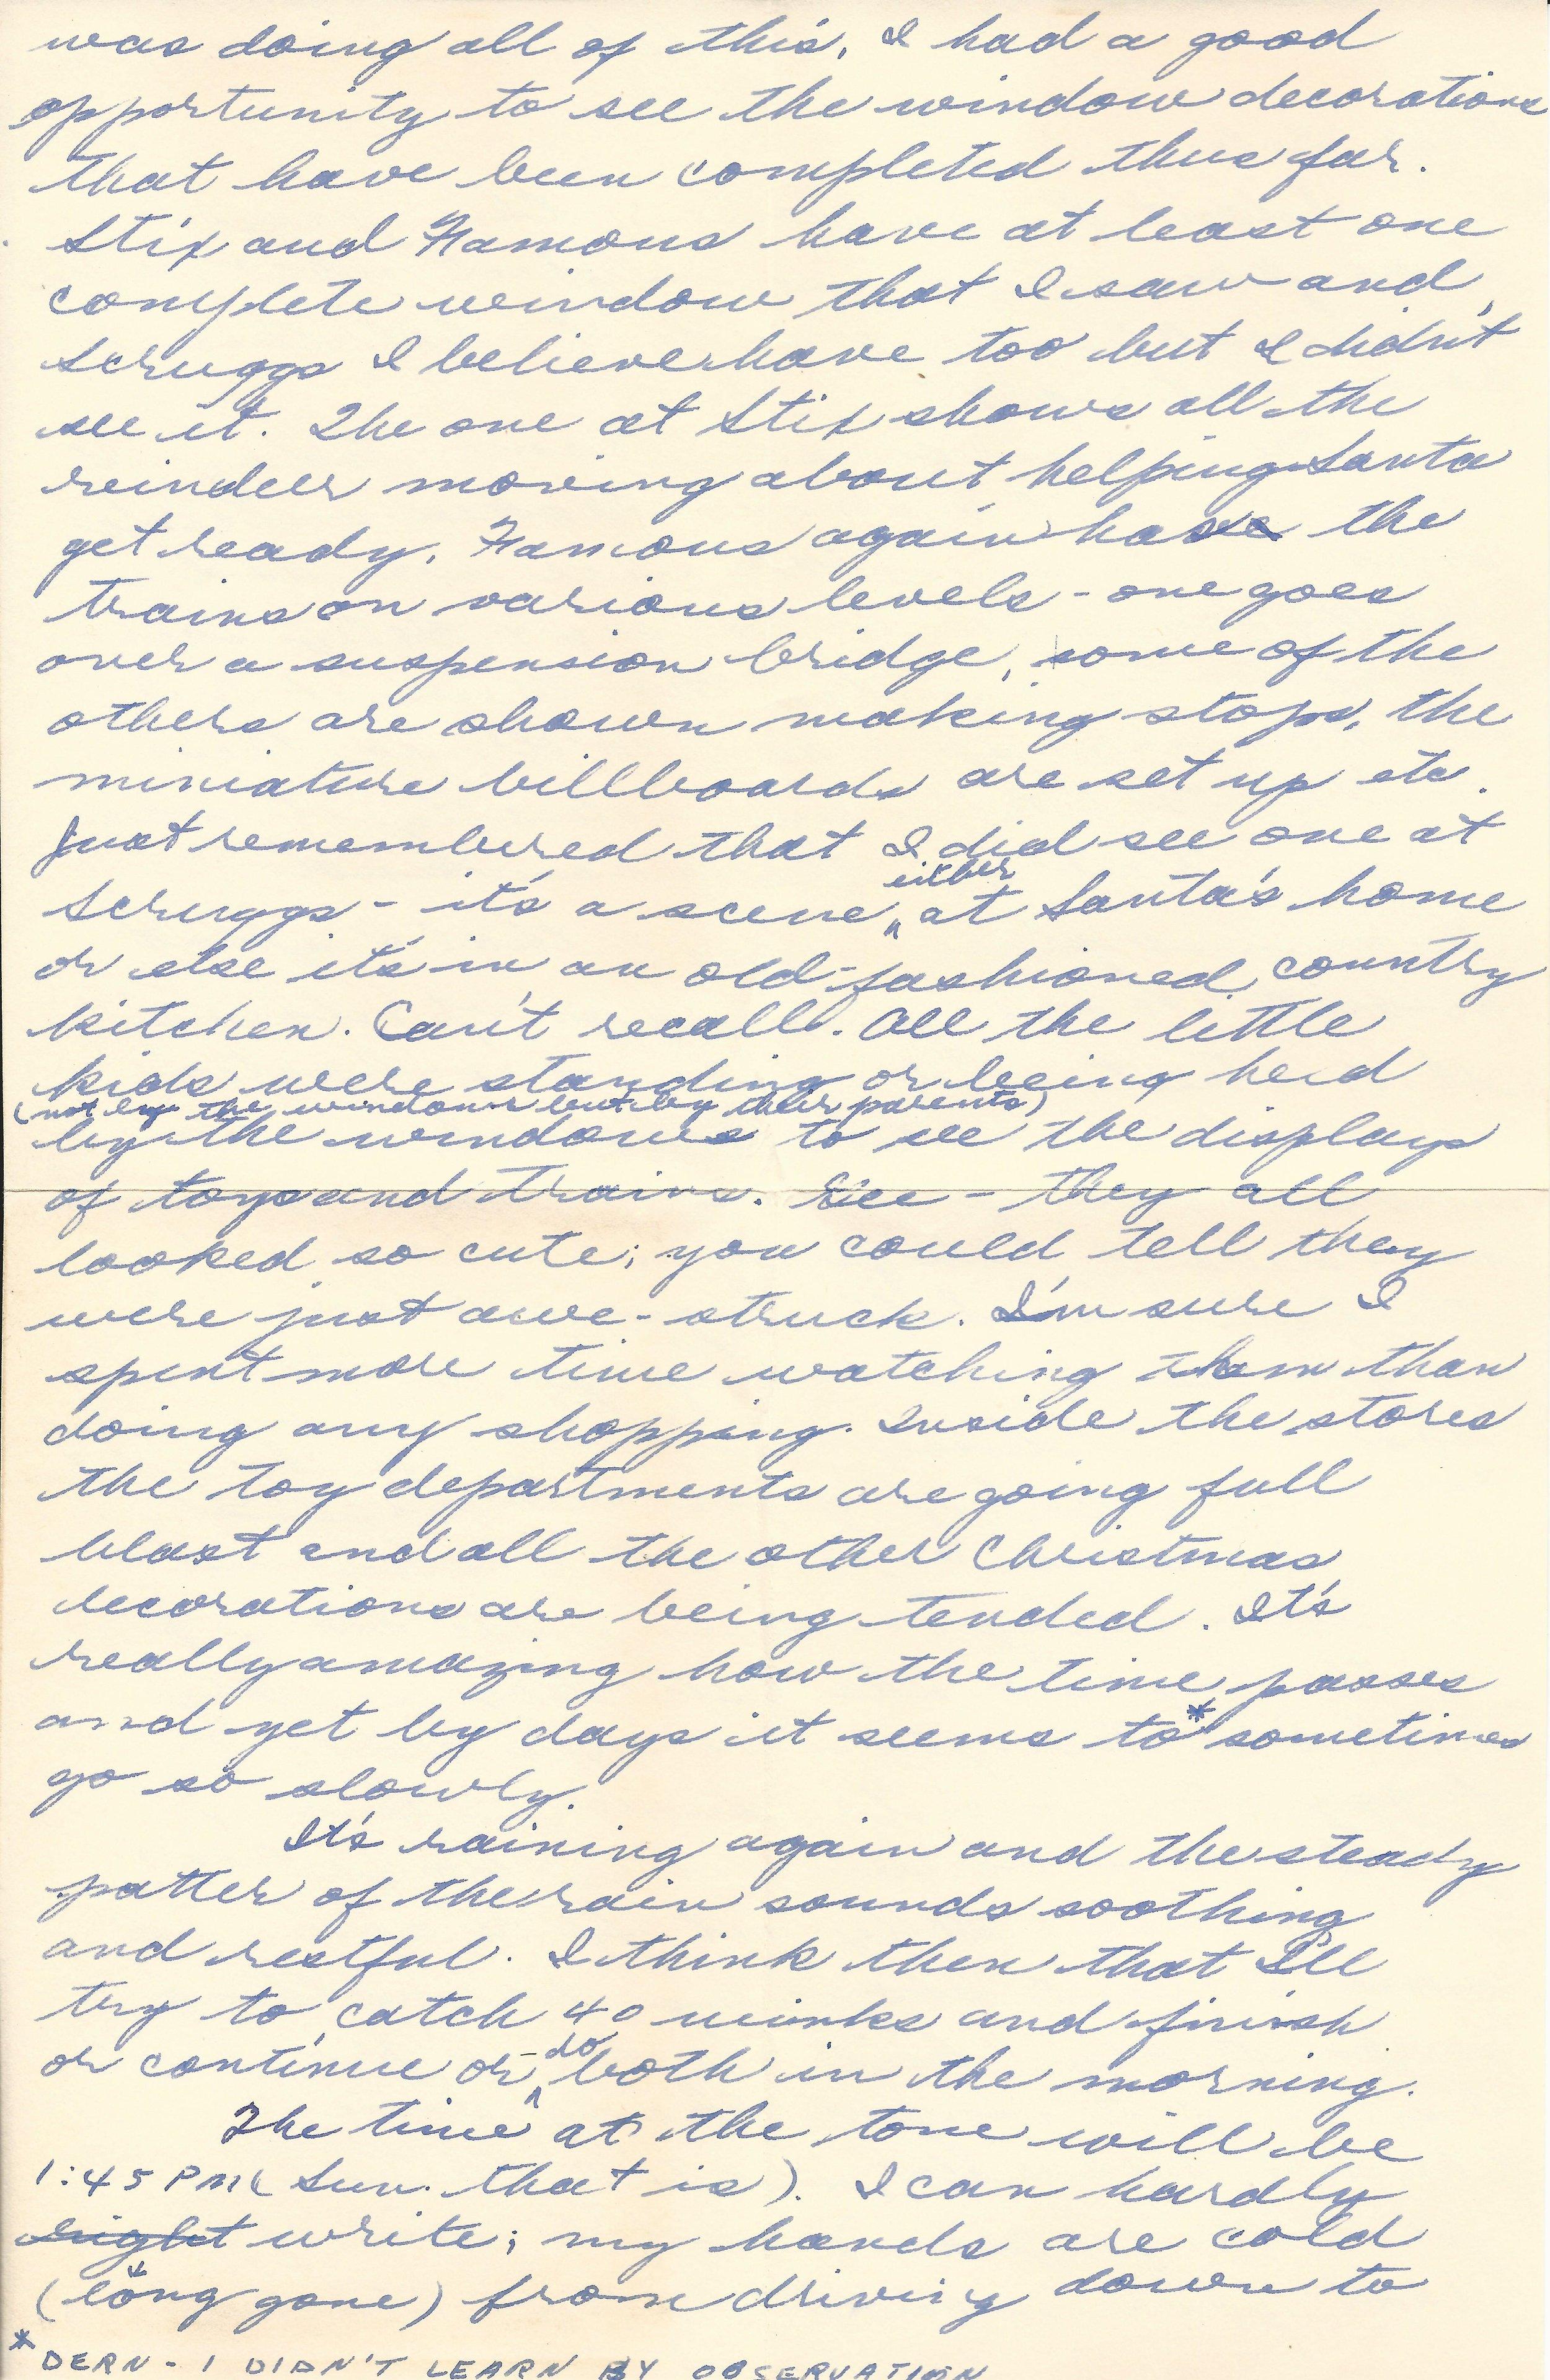 5. Nov. 8, 1952 (Oma)_Page_3.jpg